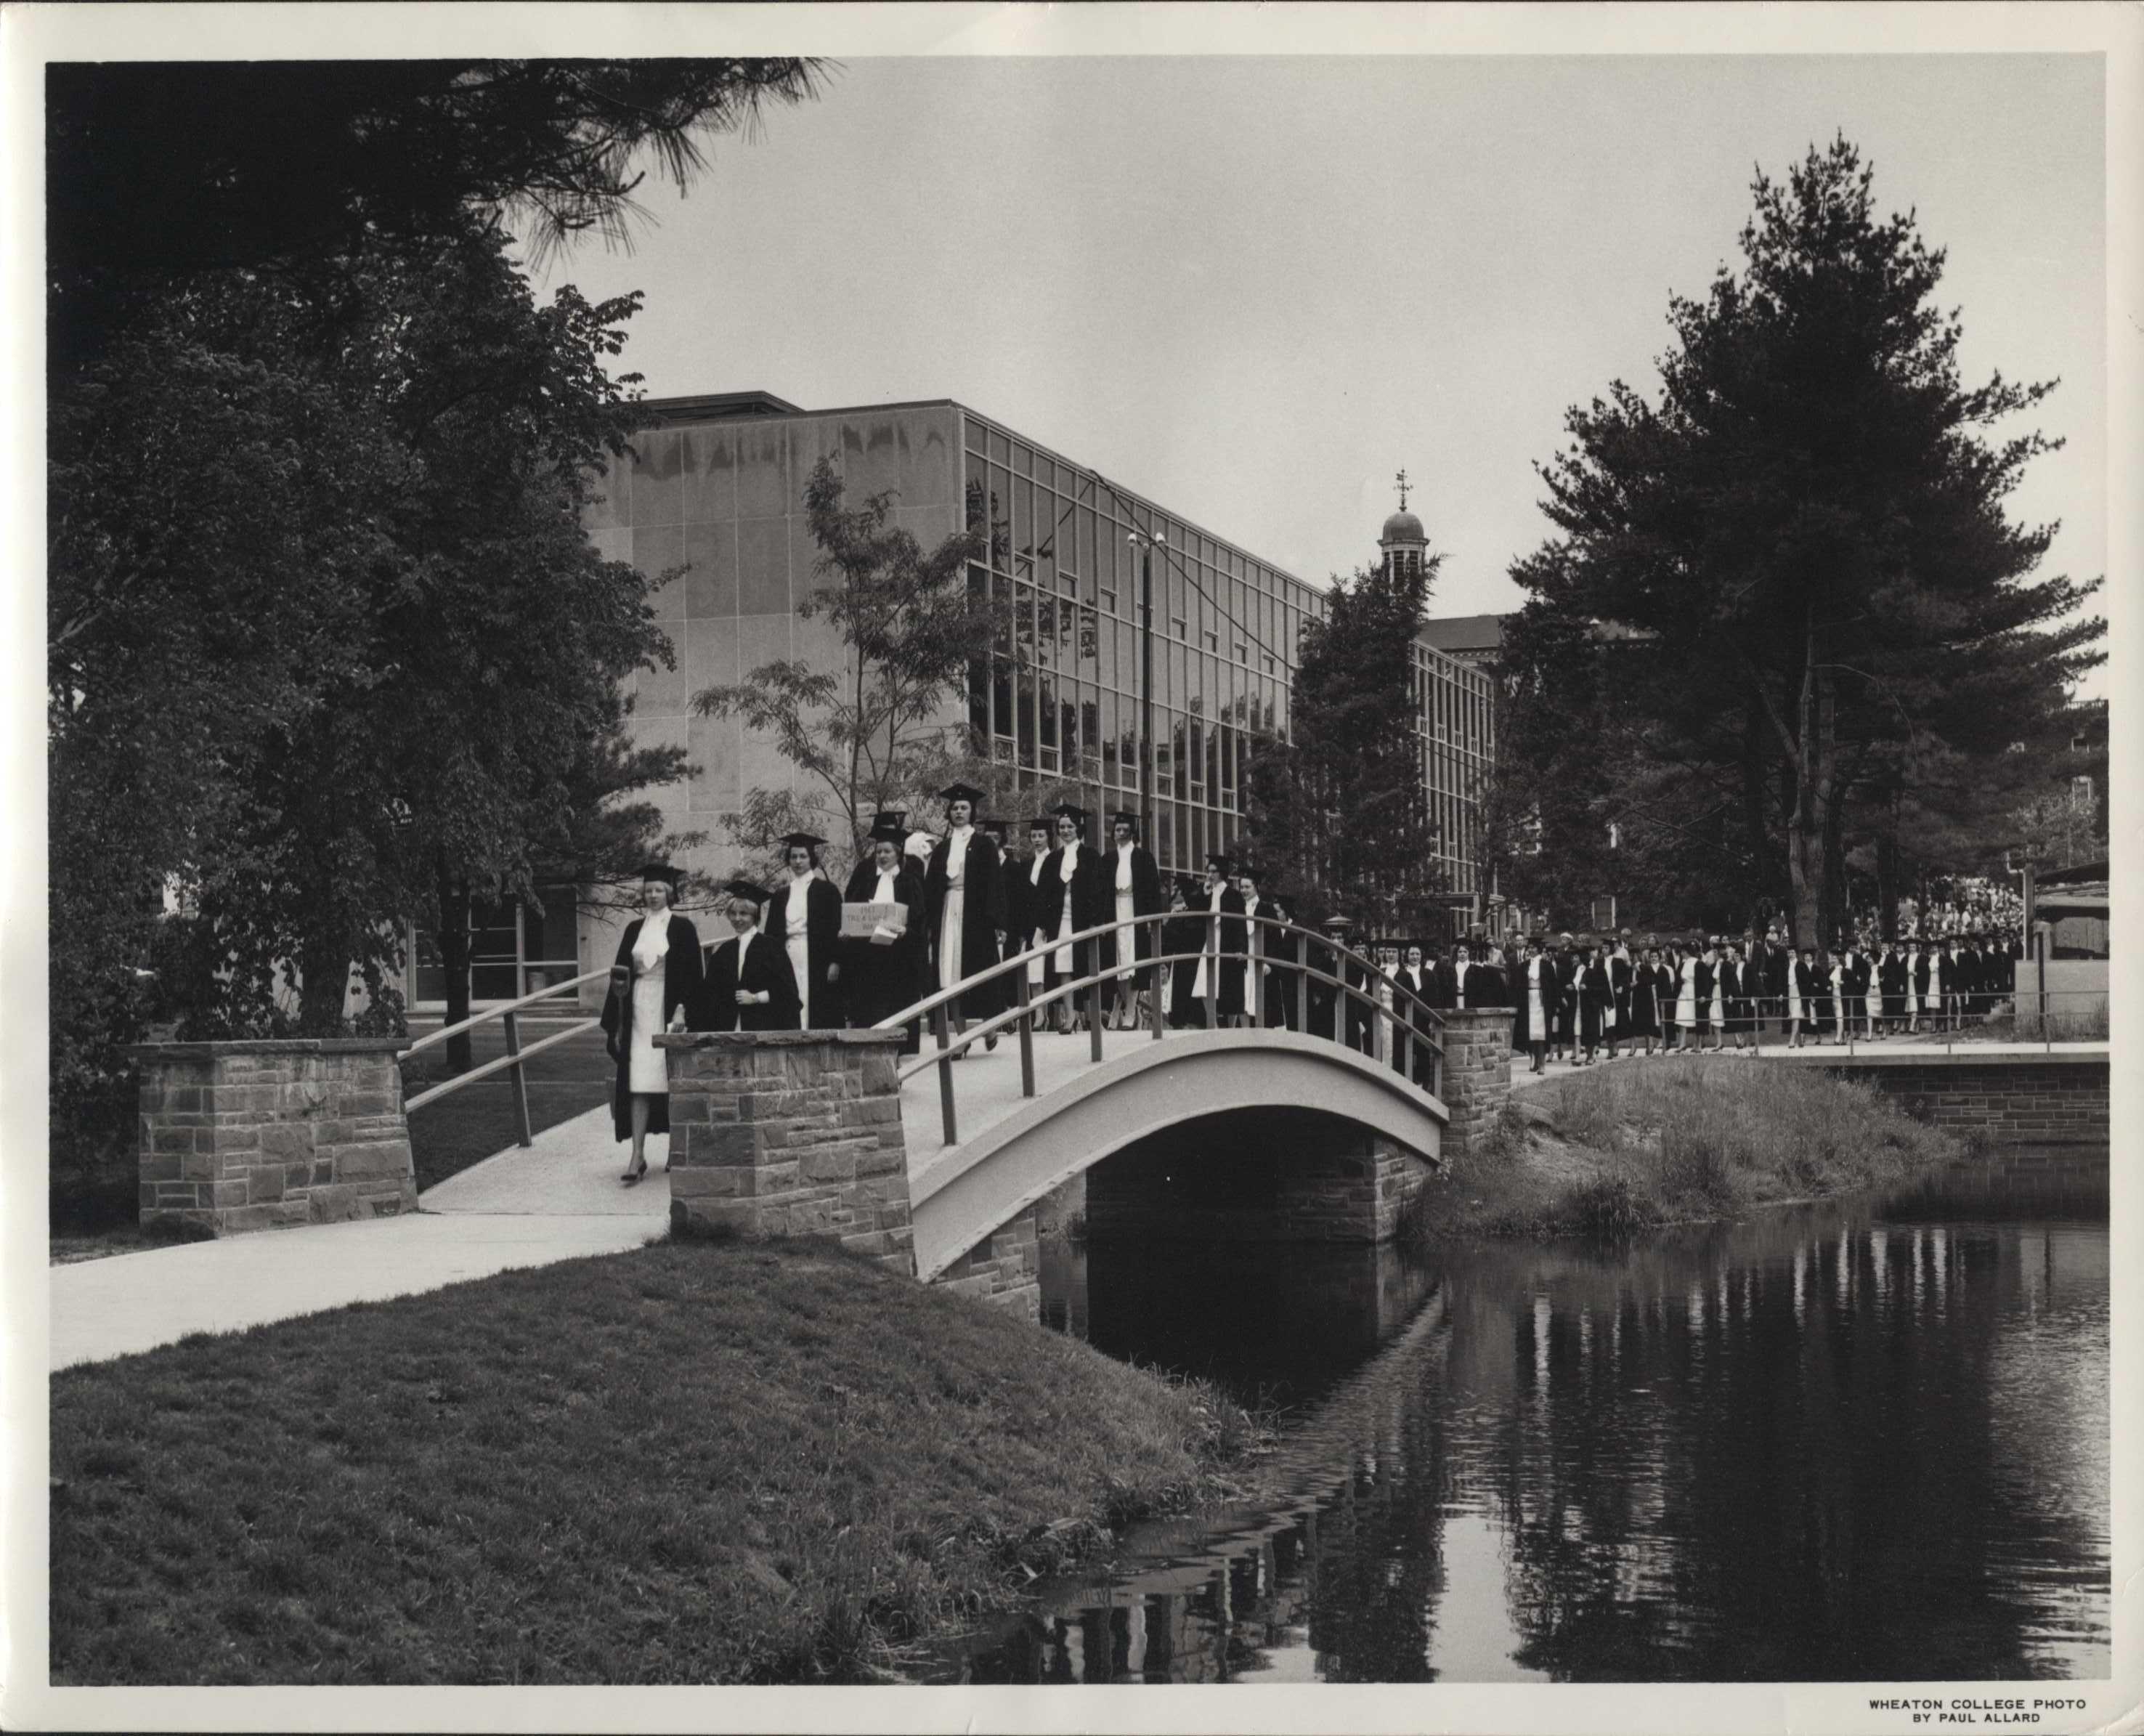 Class Day 1961 Over the Bridge